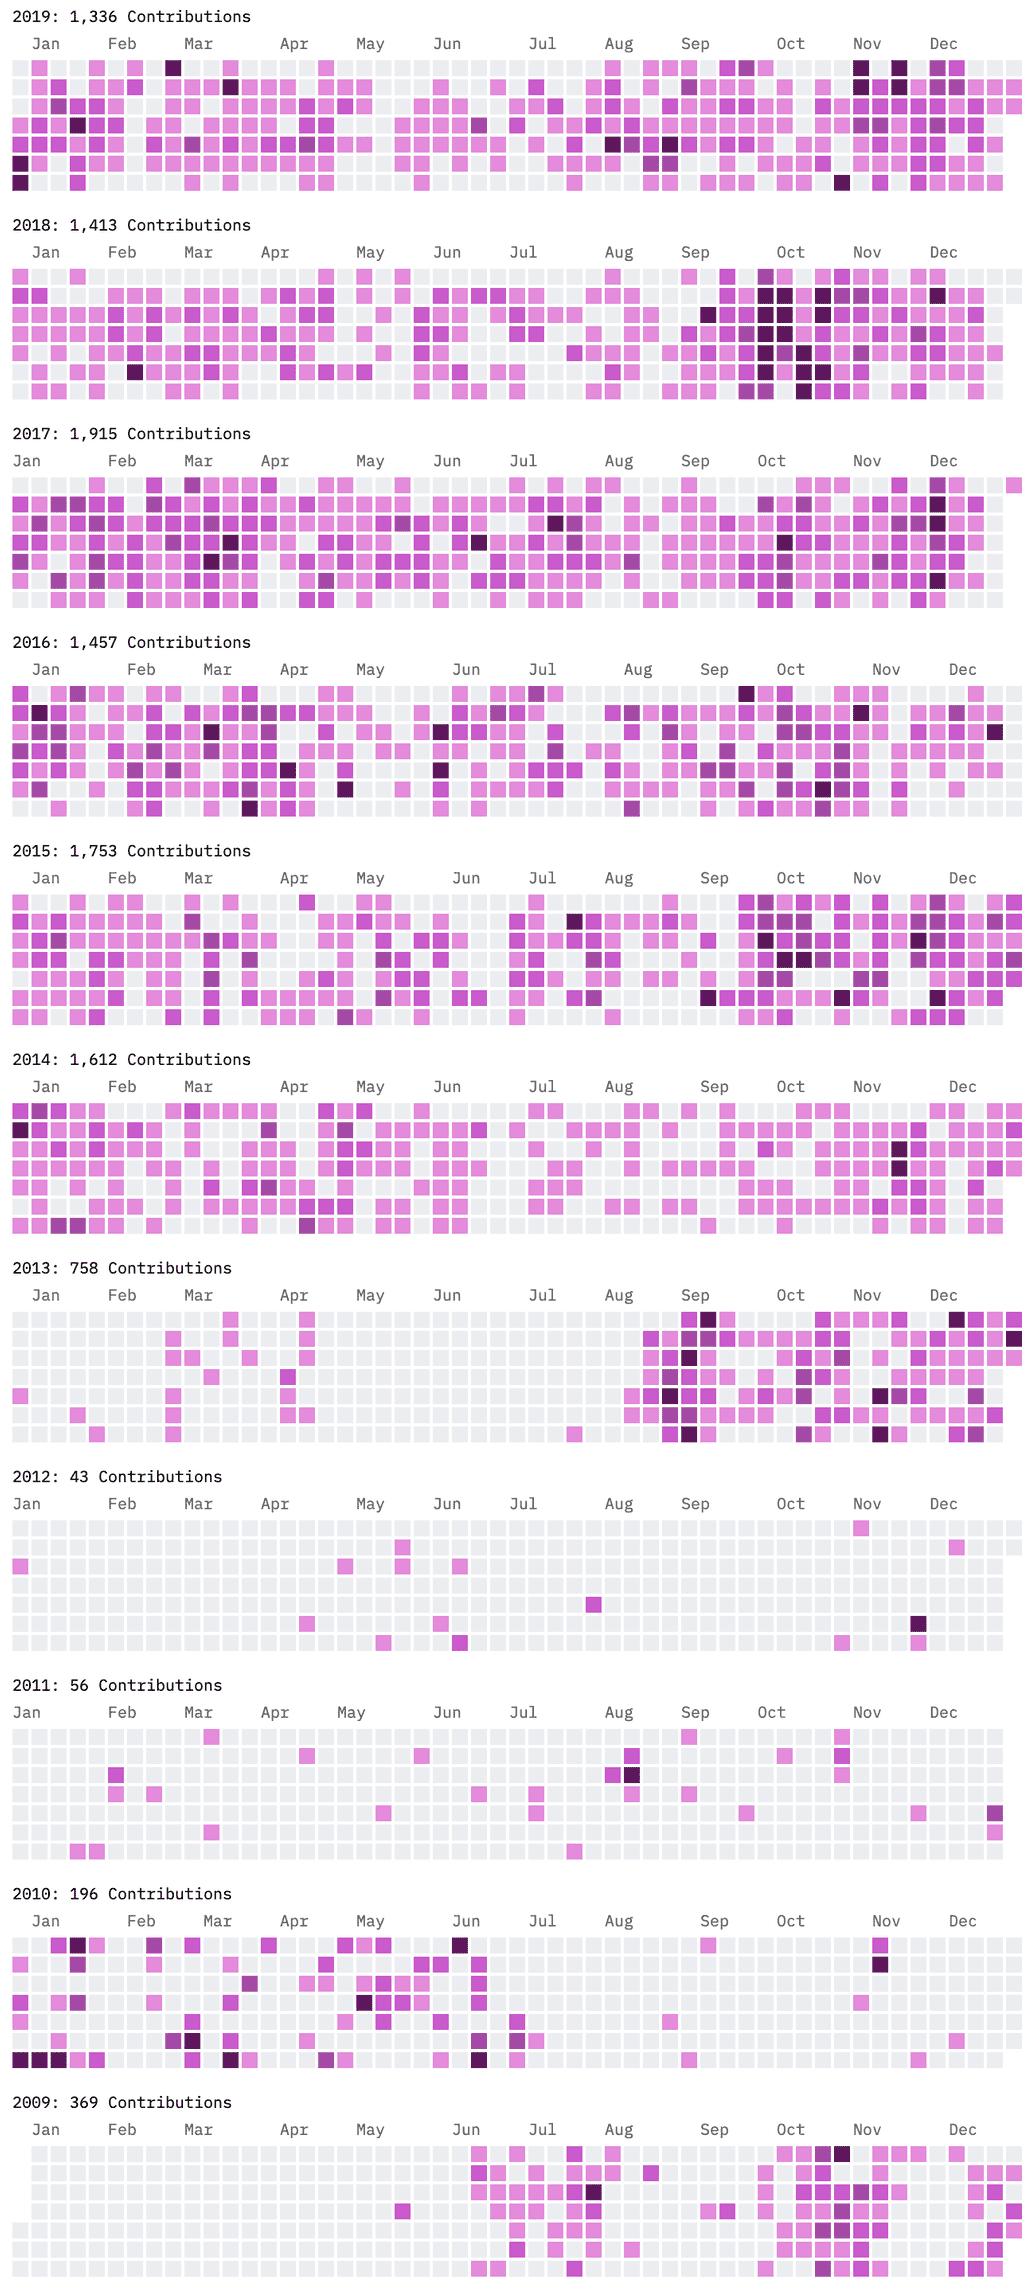 heatmap chart of 10 years of contibutions to github